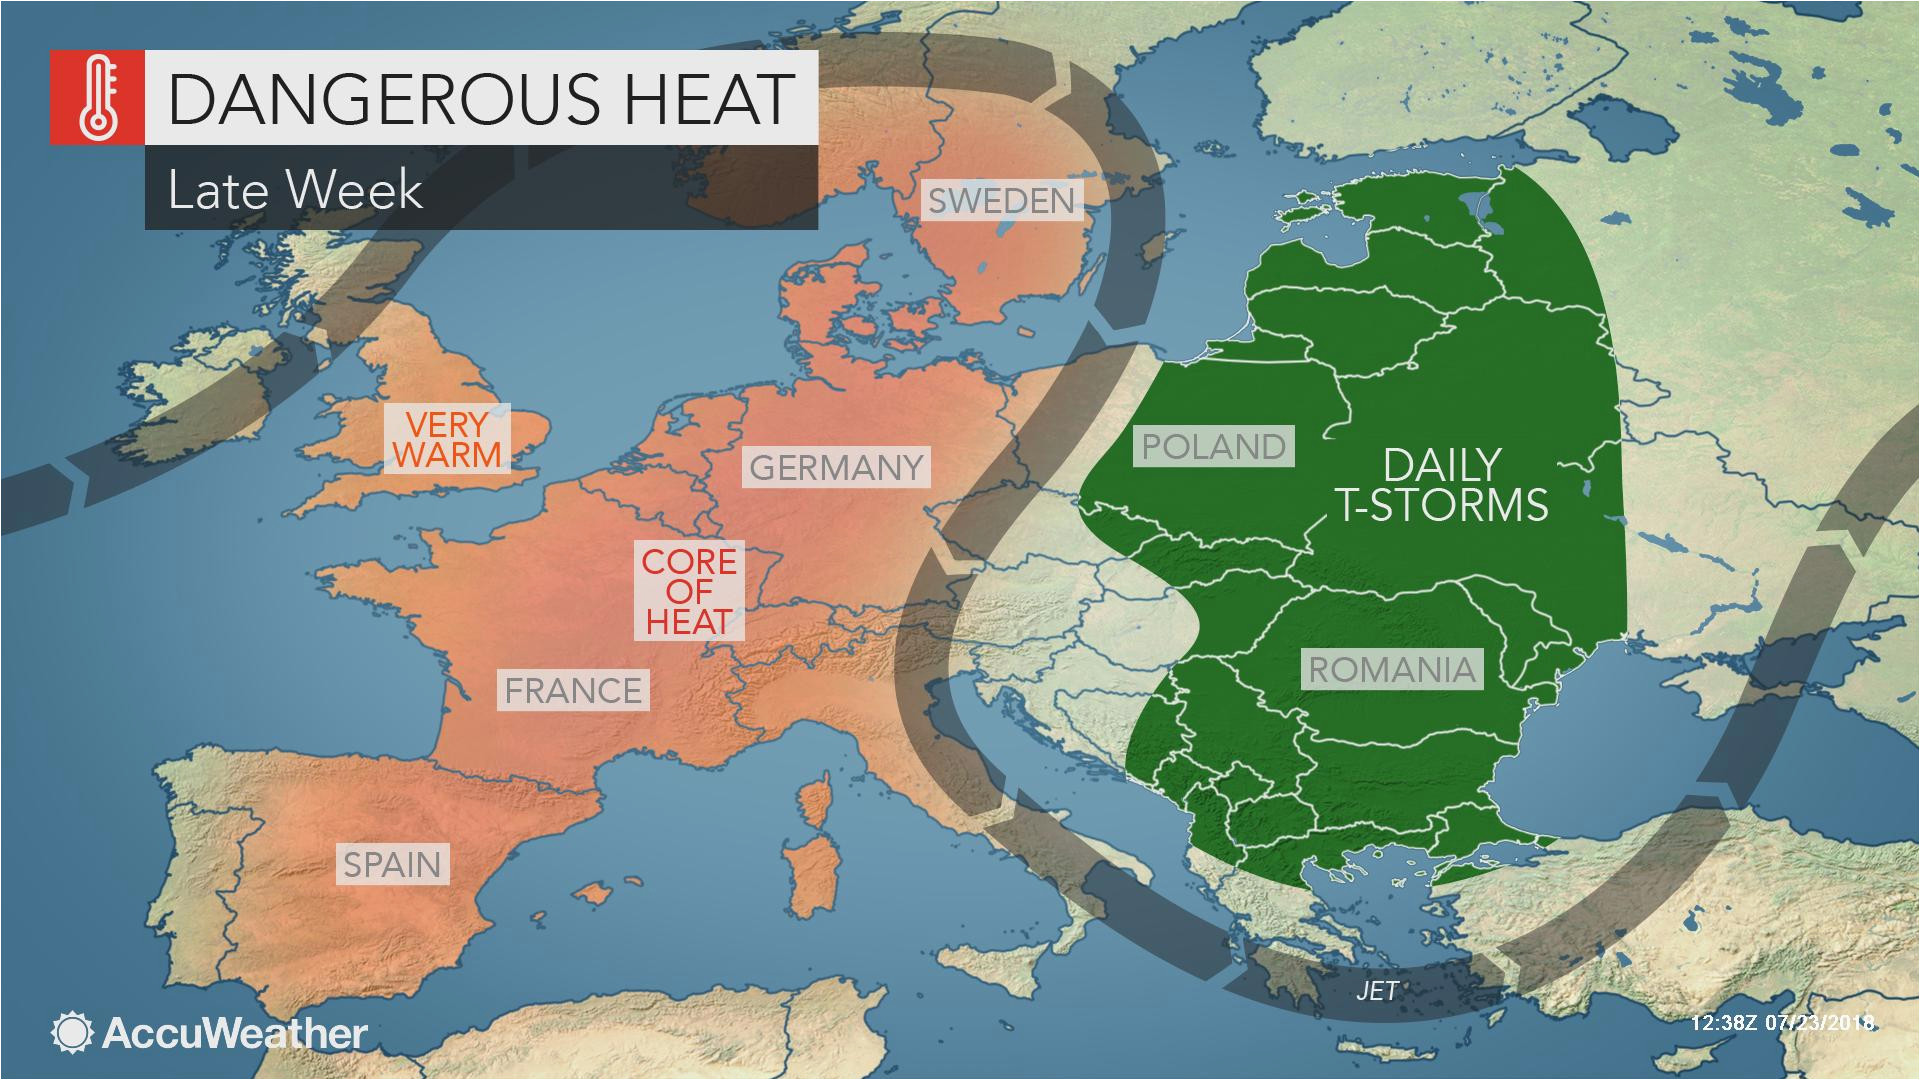 intense heat wave to bake western europe as wildfires rage